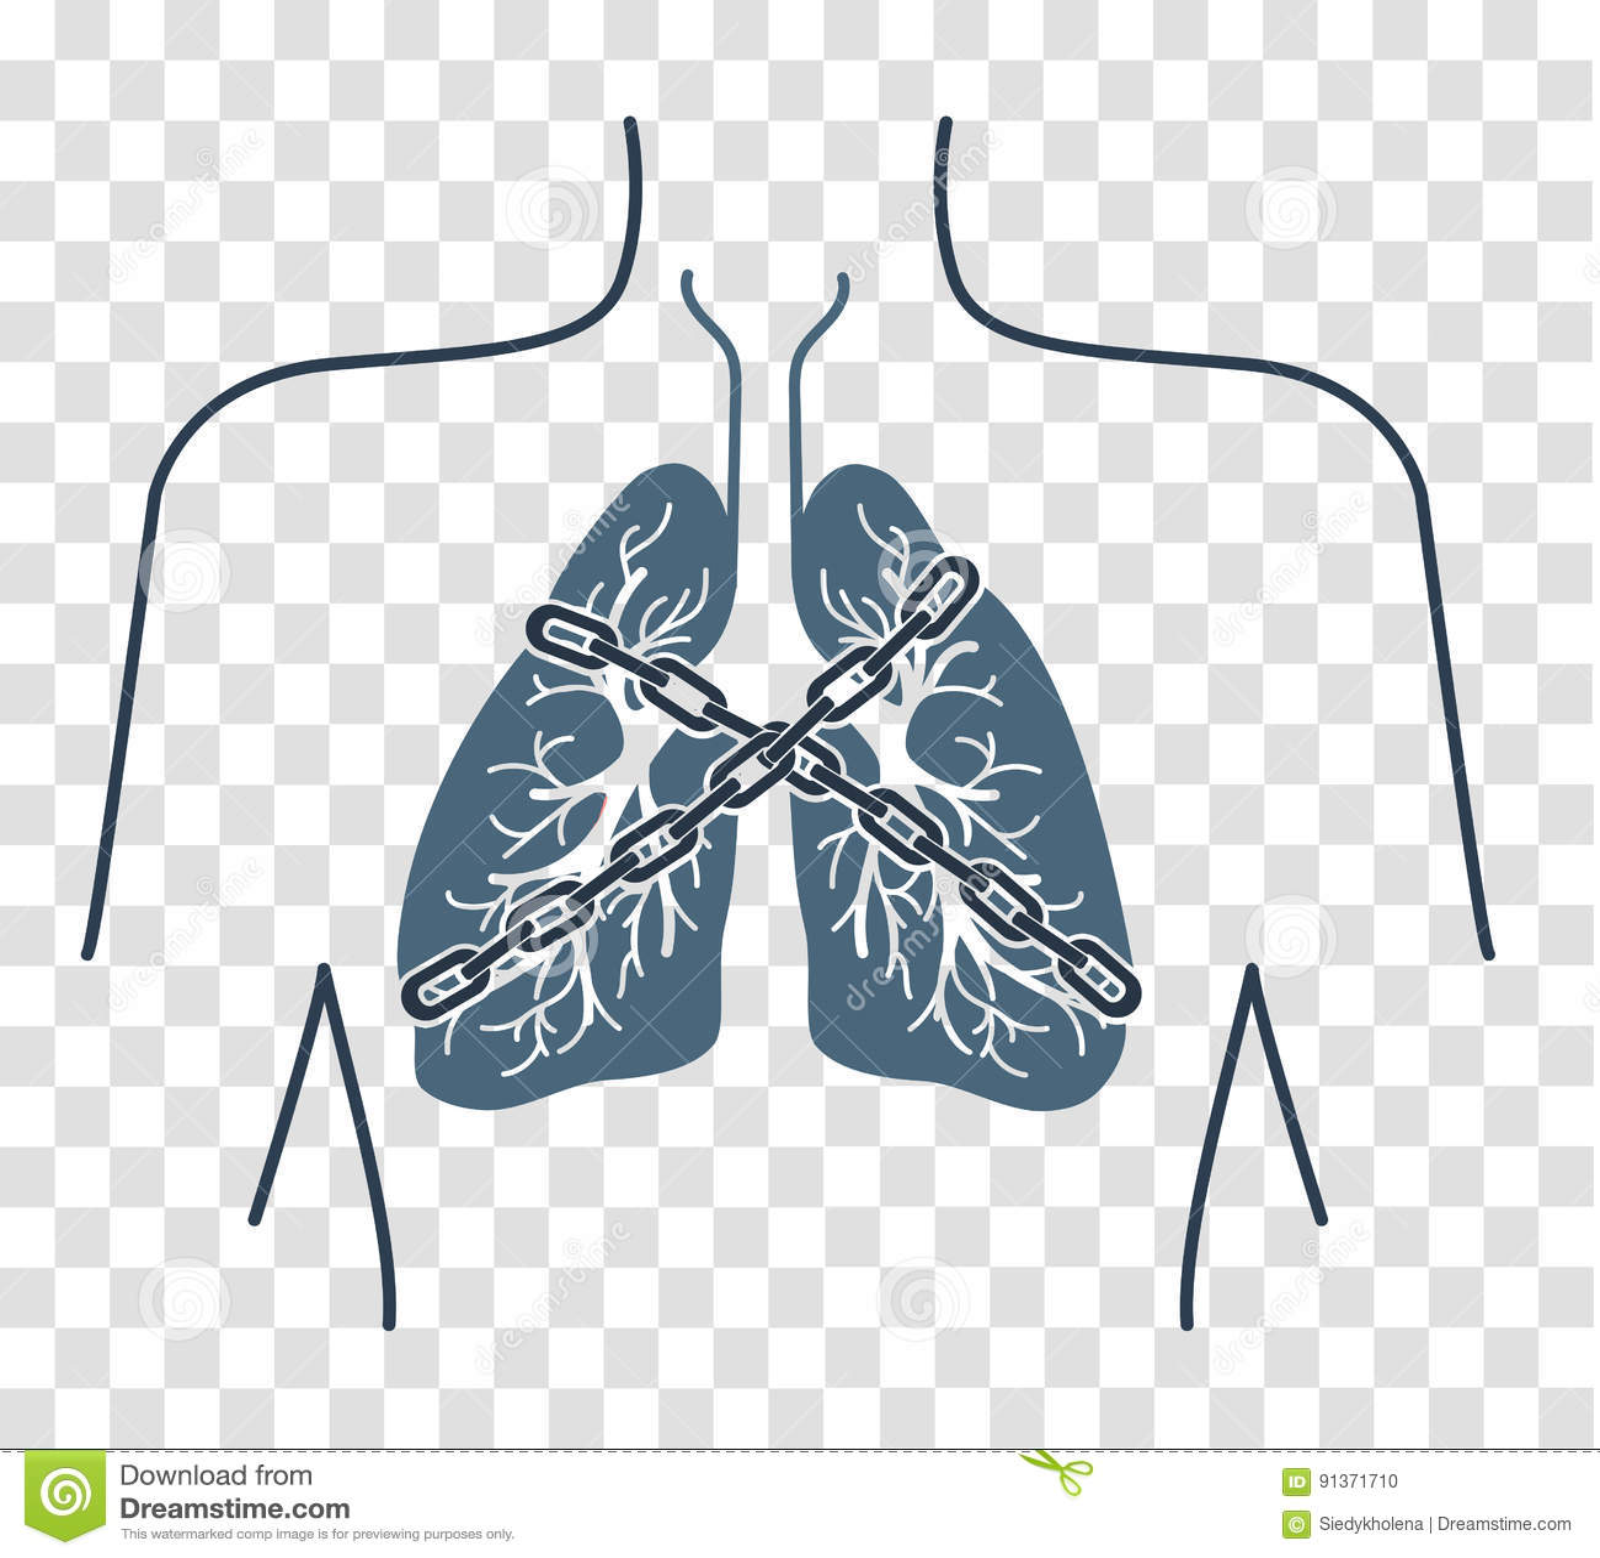 Patient And Inhaler Icon